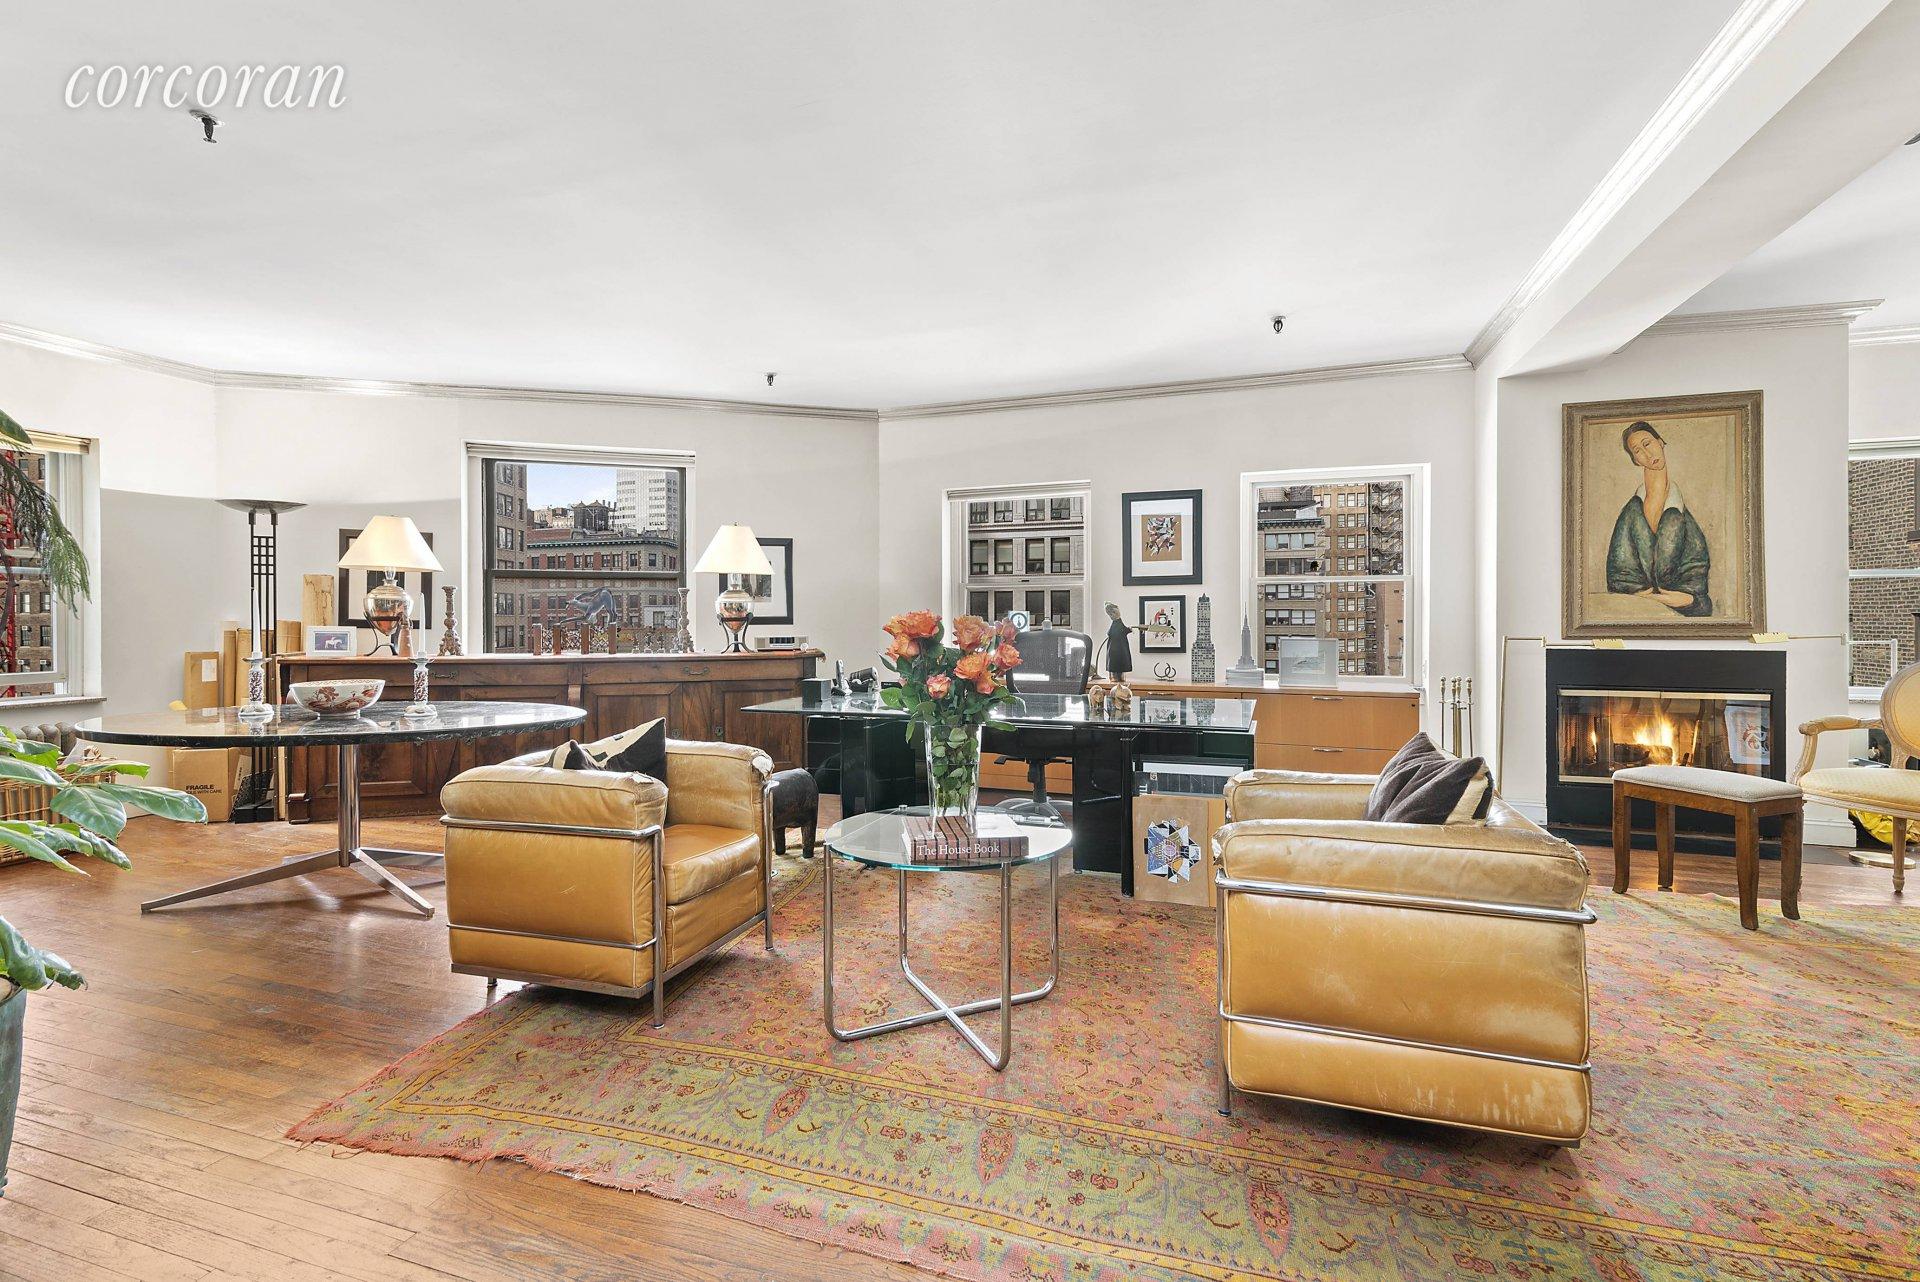 Ad Sale Apartment New York (10001) ref:5706211